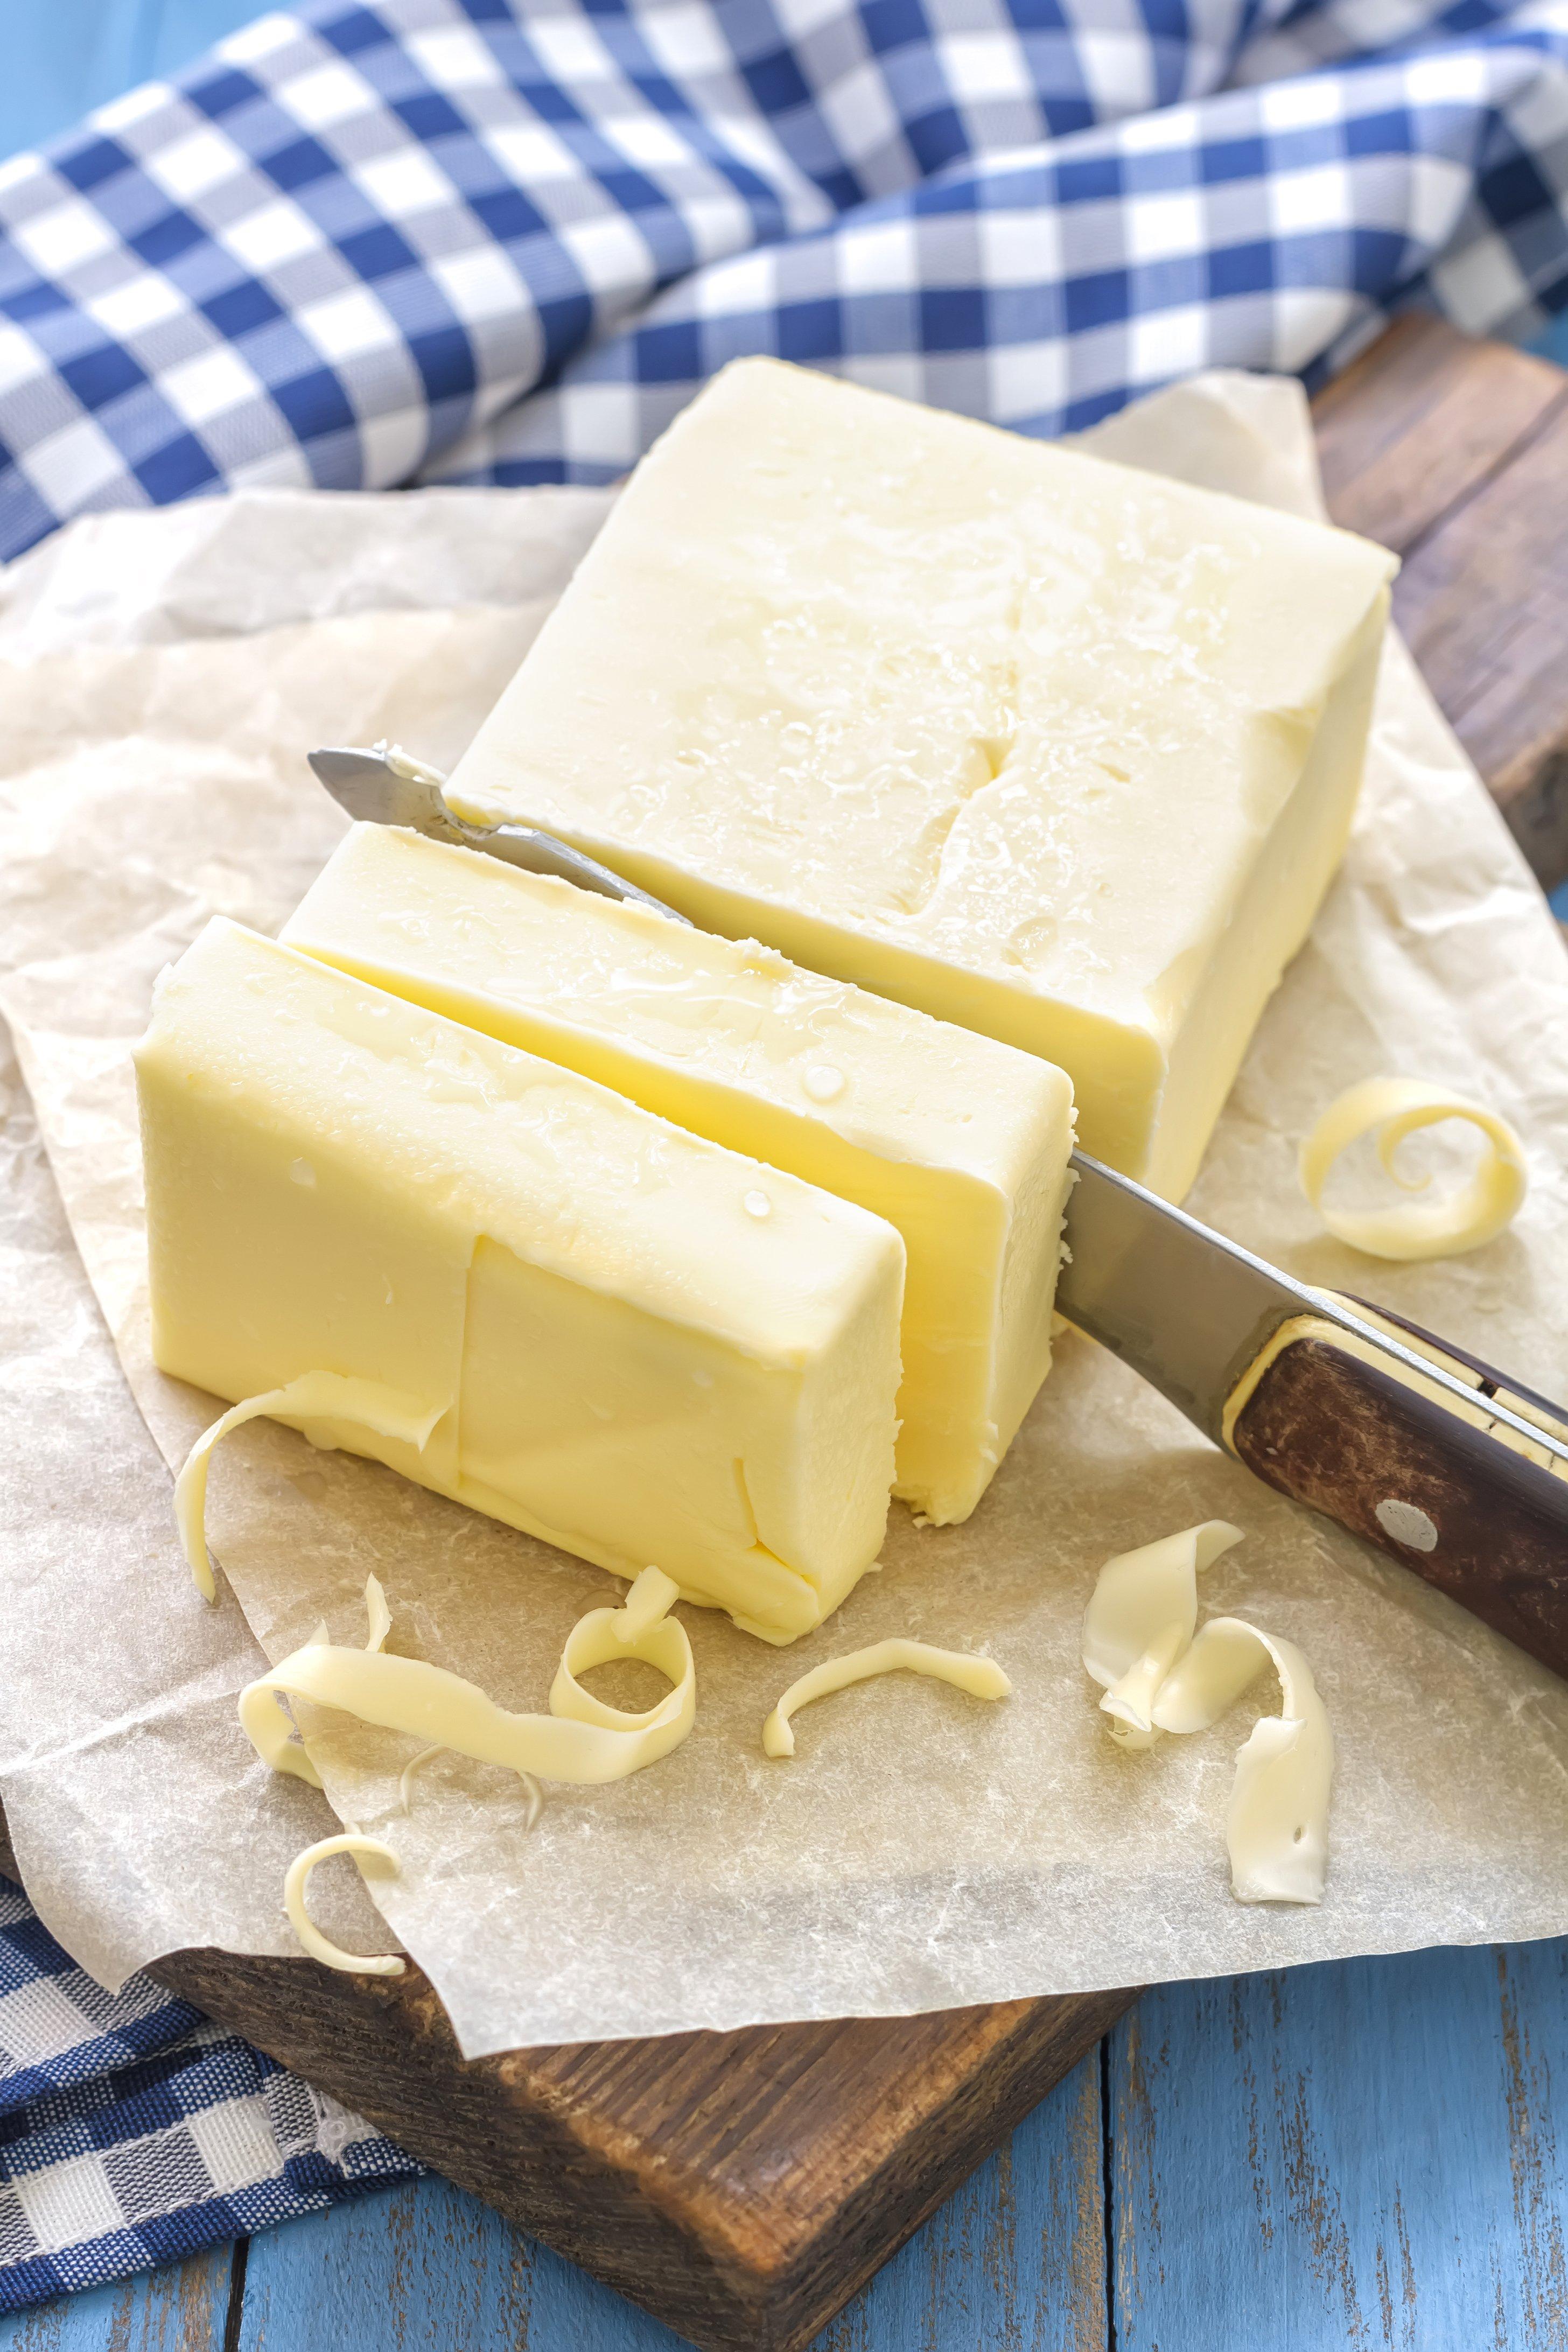 Unsalted Butter Adalah : unsalted, butter, adalah, Sweet, Cream, Butter?, Kitchn